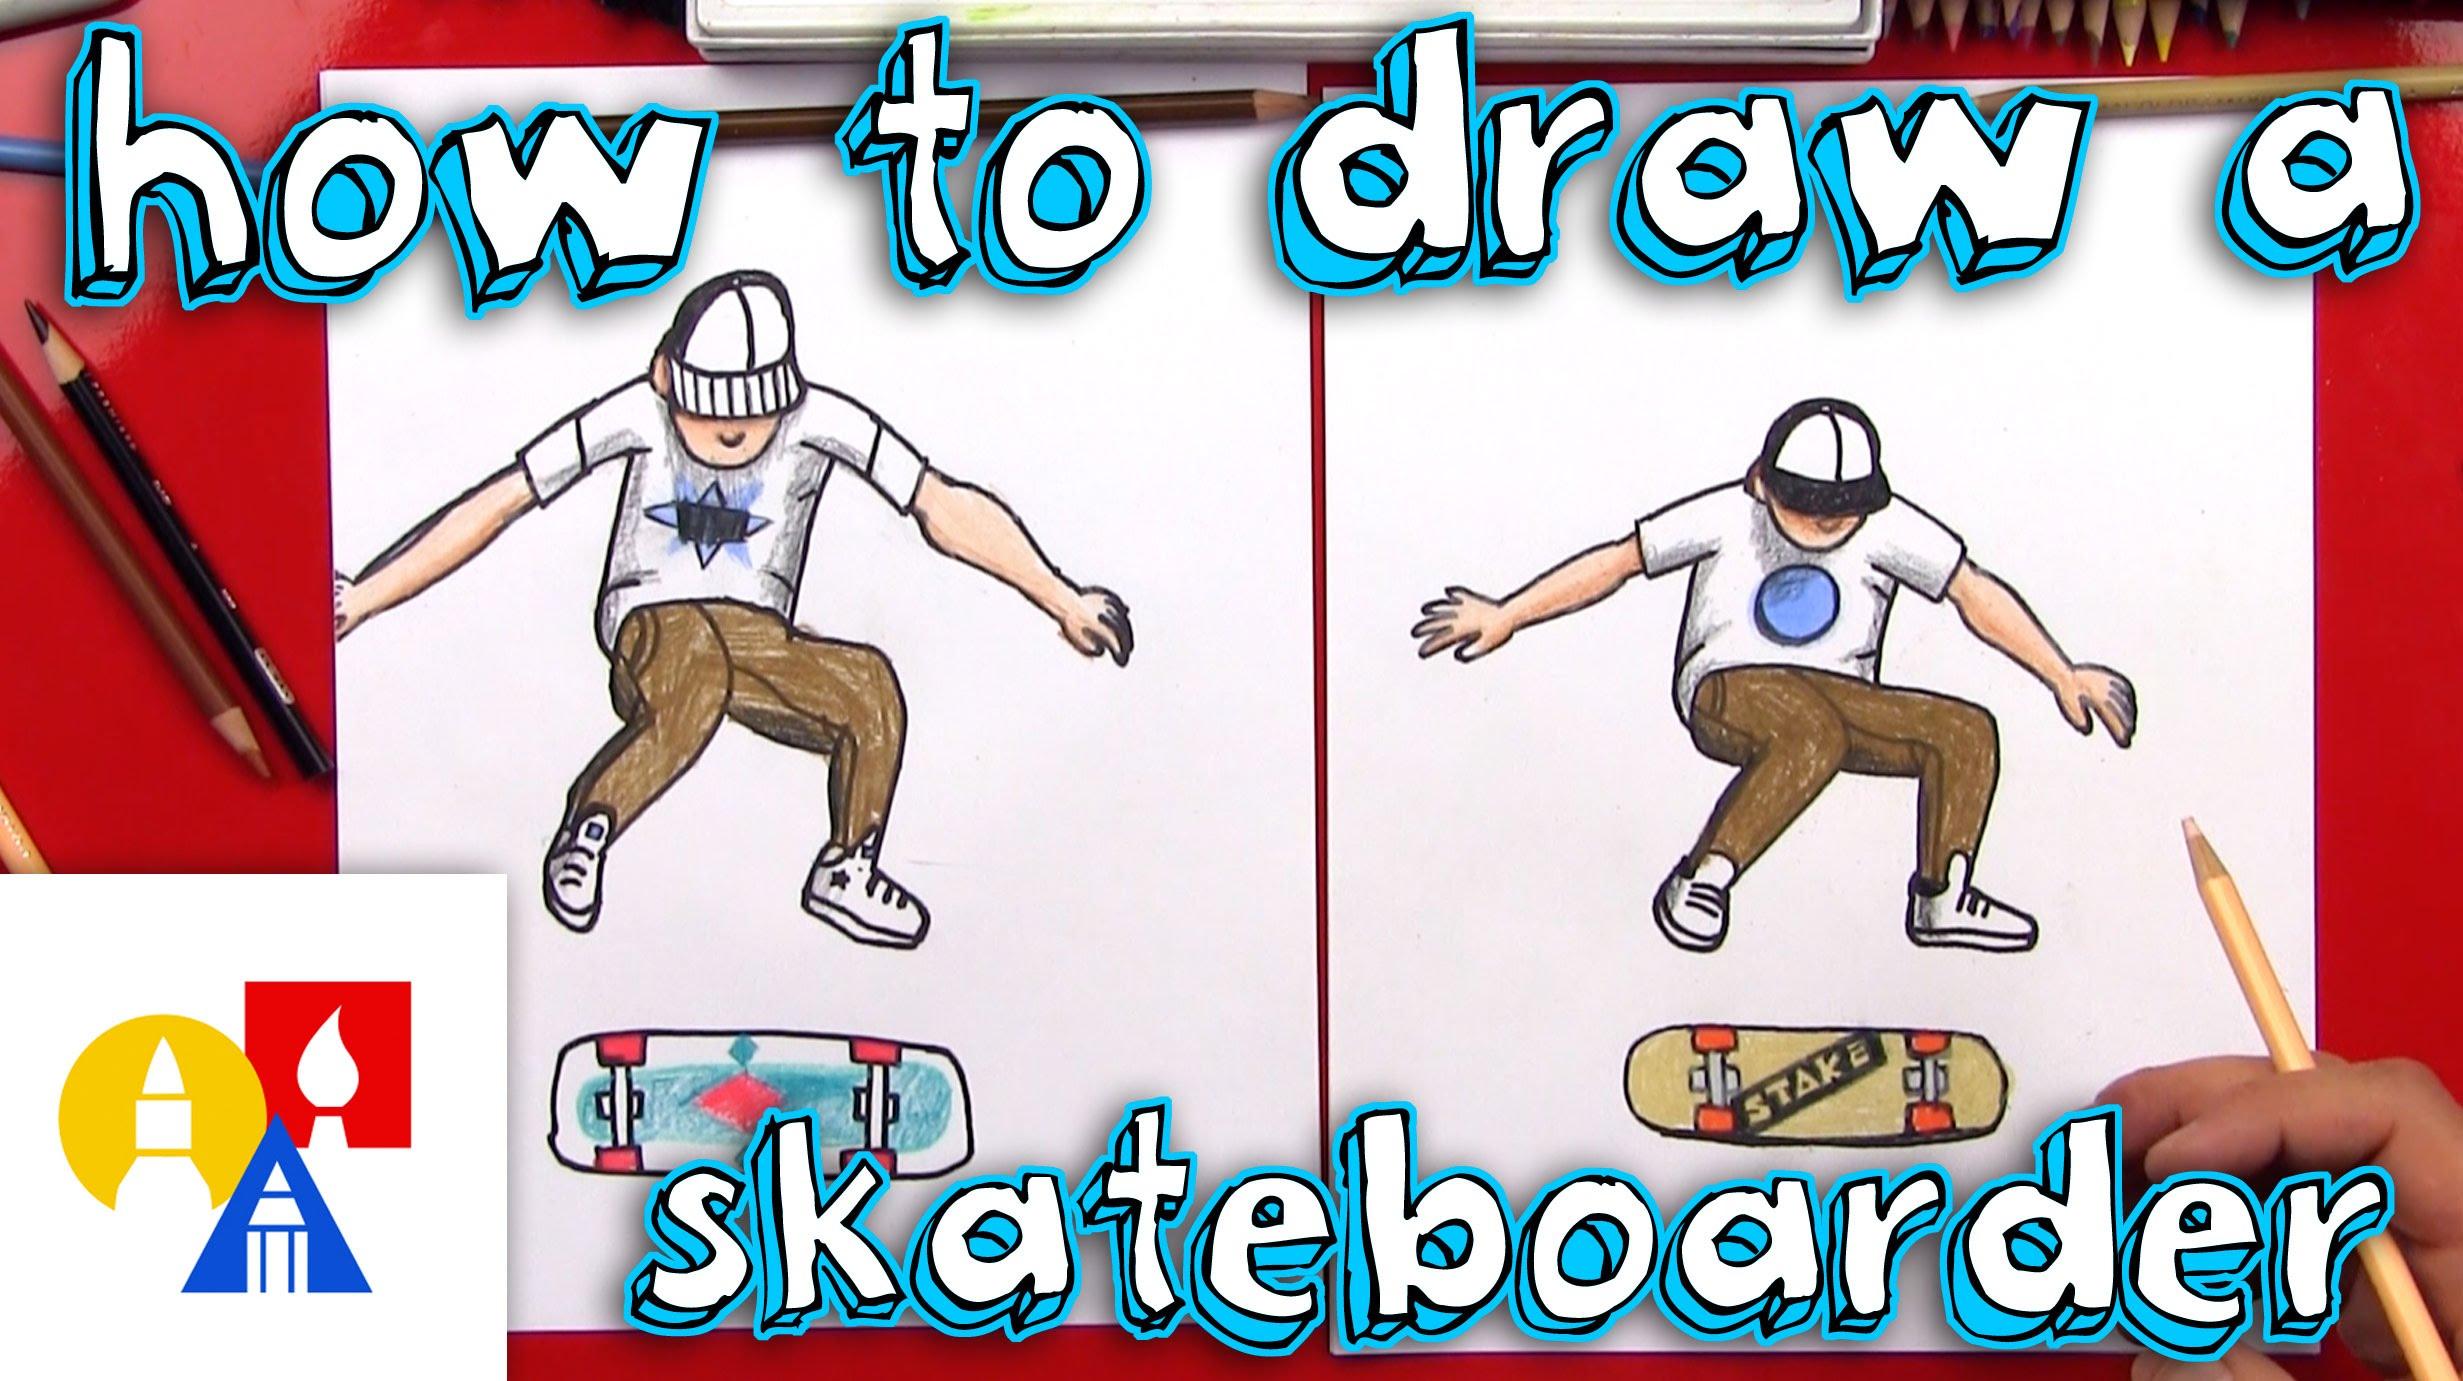 2463x1381 How To Draw A Skateboarder Doing A Kickflip